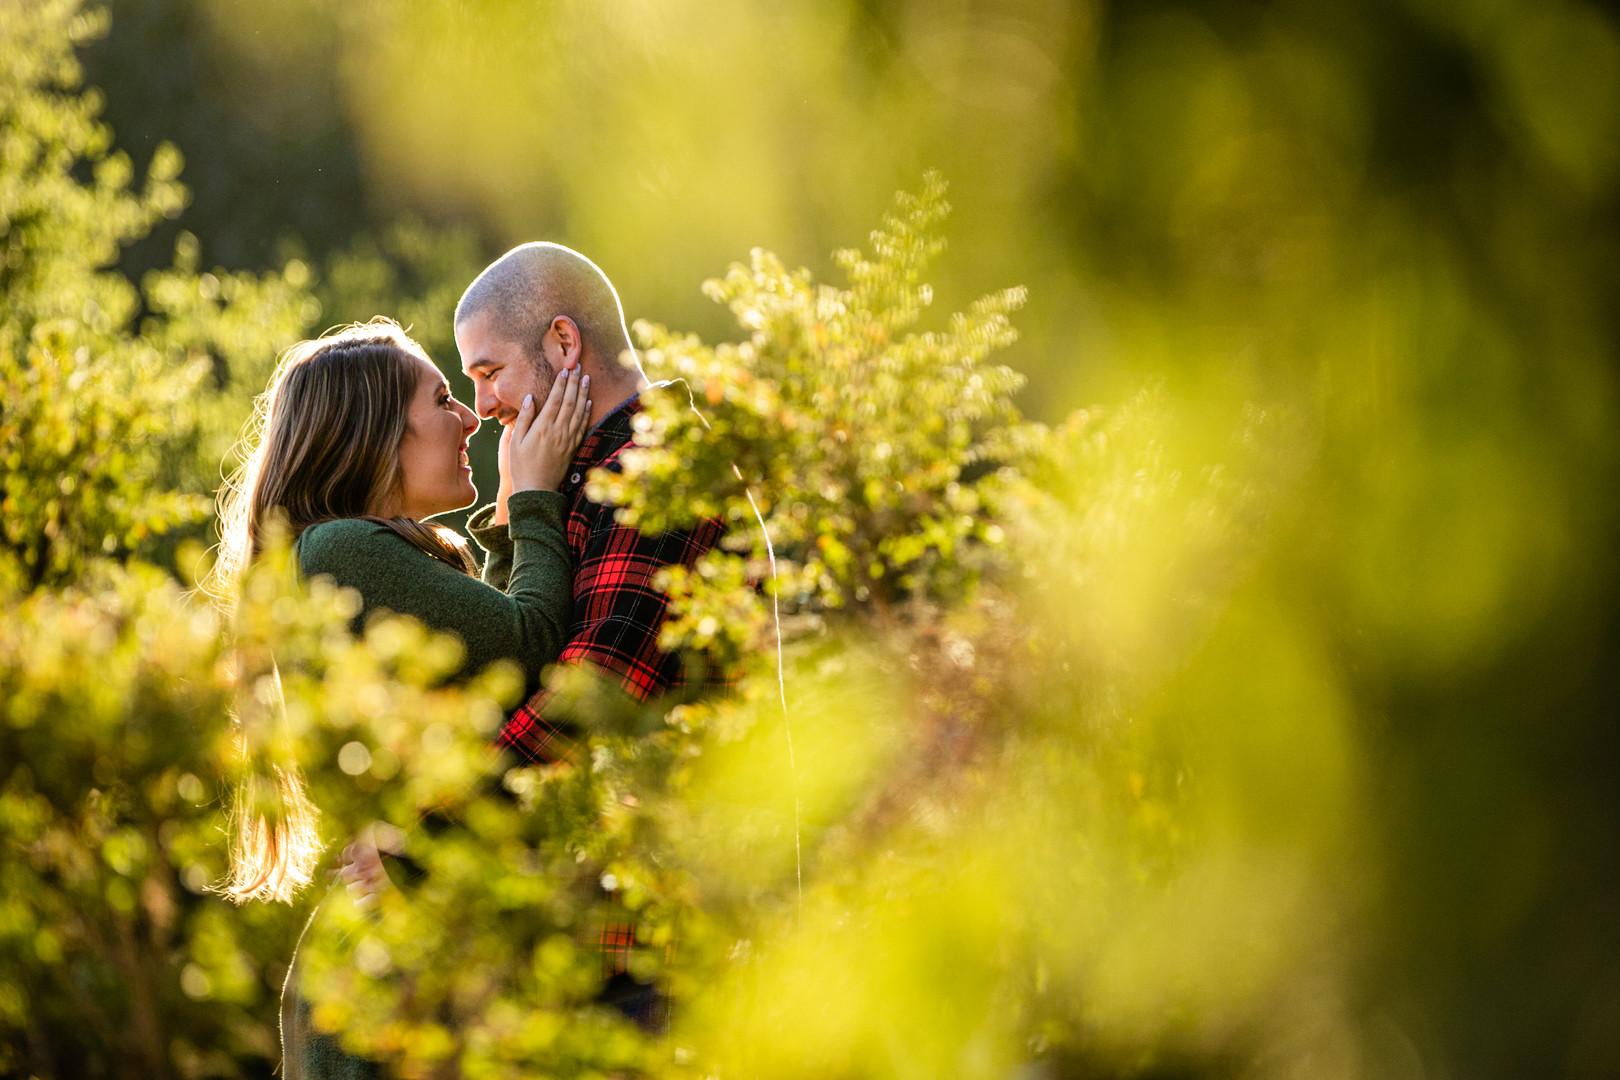 Lauren&Daniel-Engagement-2020-3625.jpg